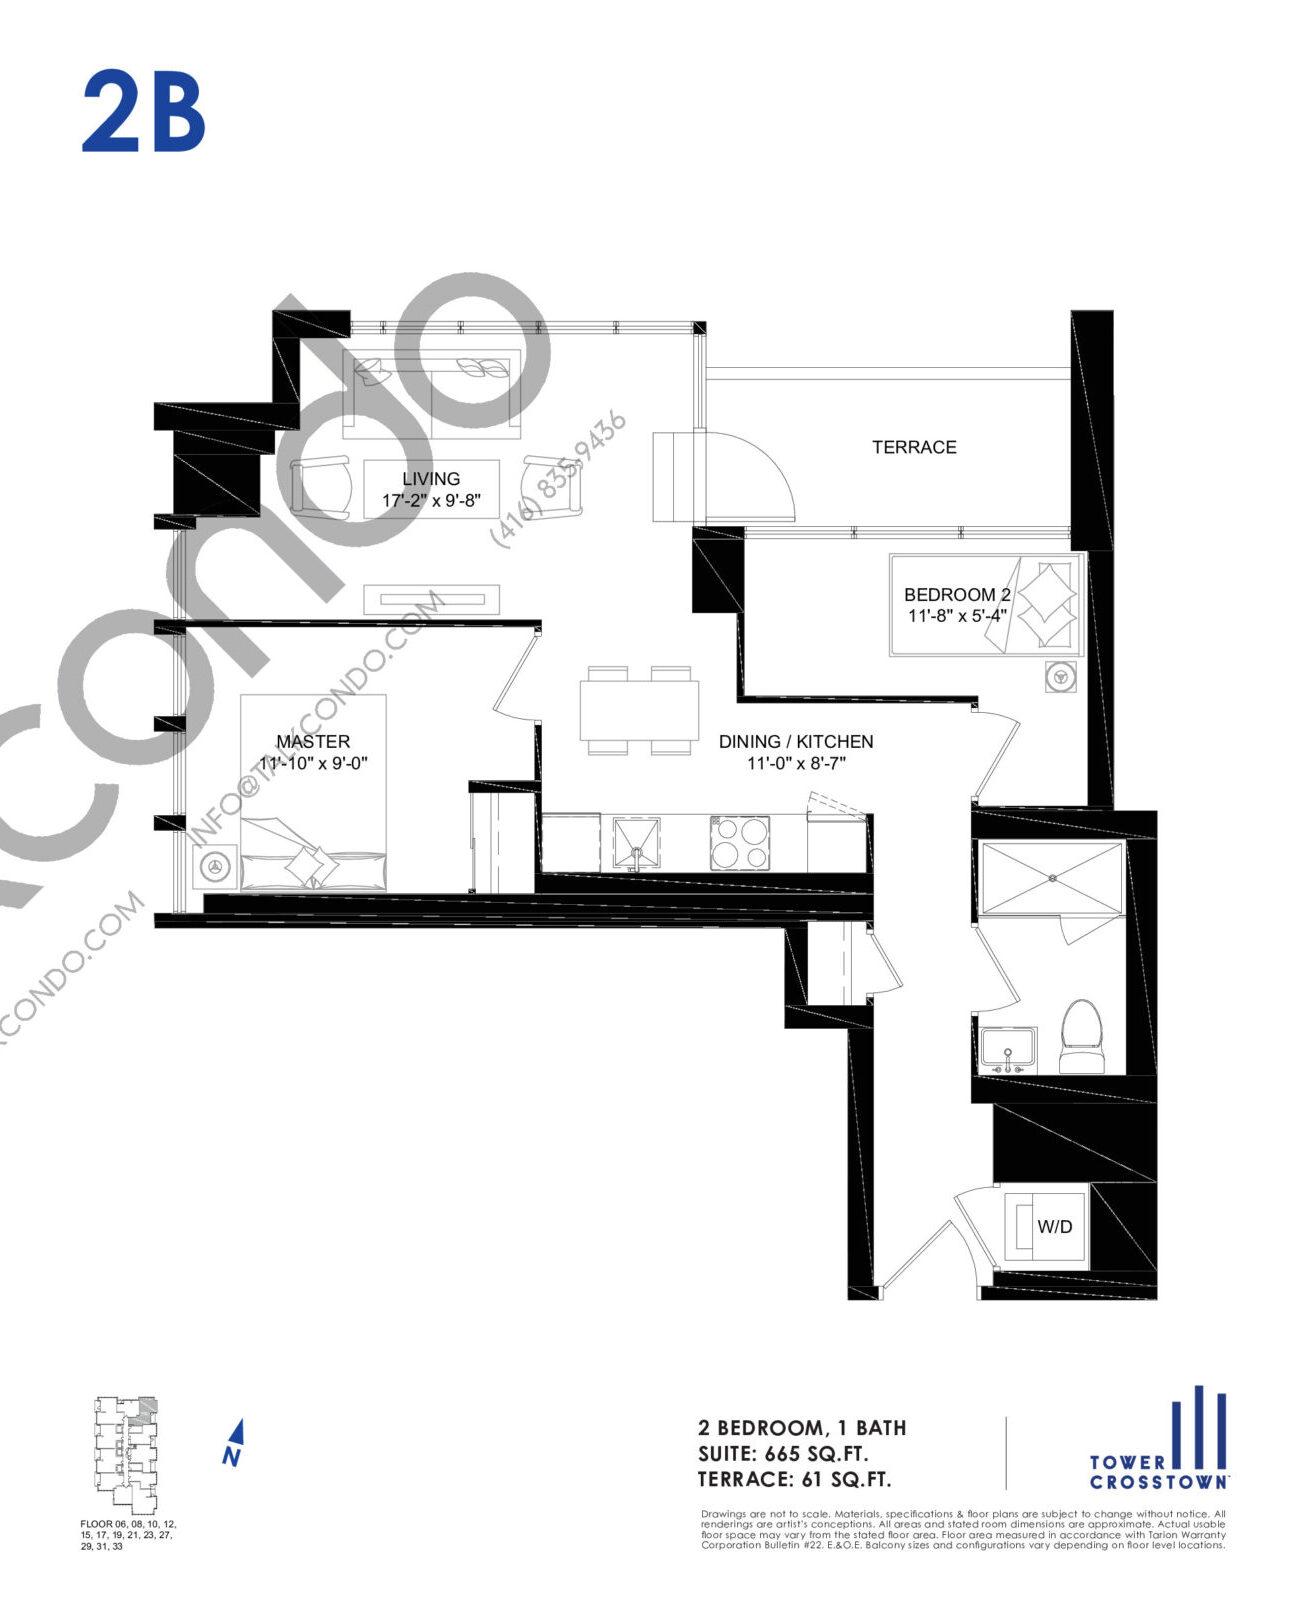 2B Floor Plan at Crosstown Tower 3 Condos - 665 sq.ft